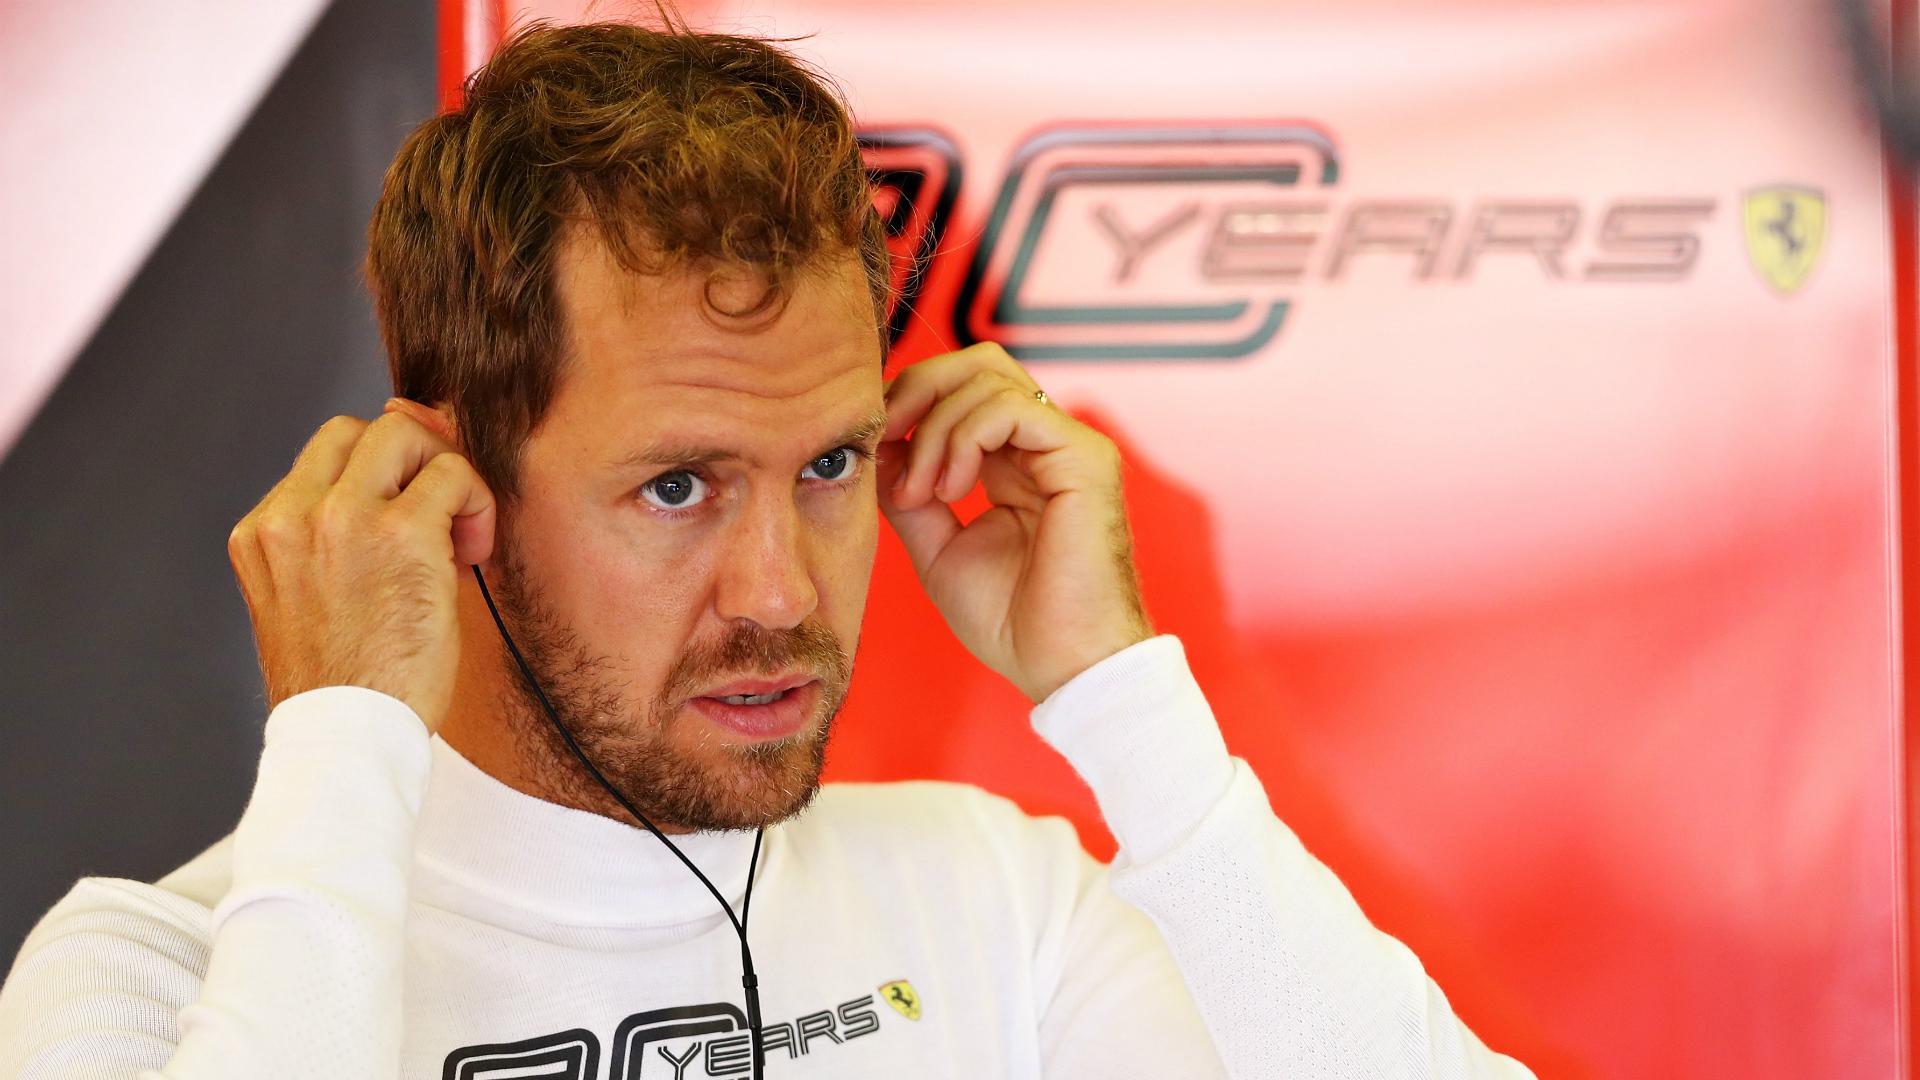 At least I took part! – Vettel after latest qualifying struggles